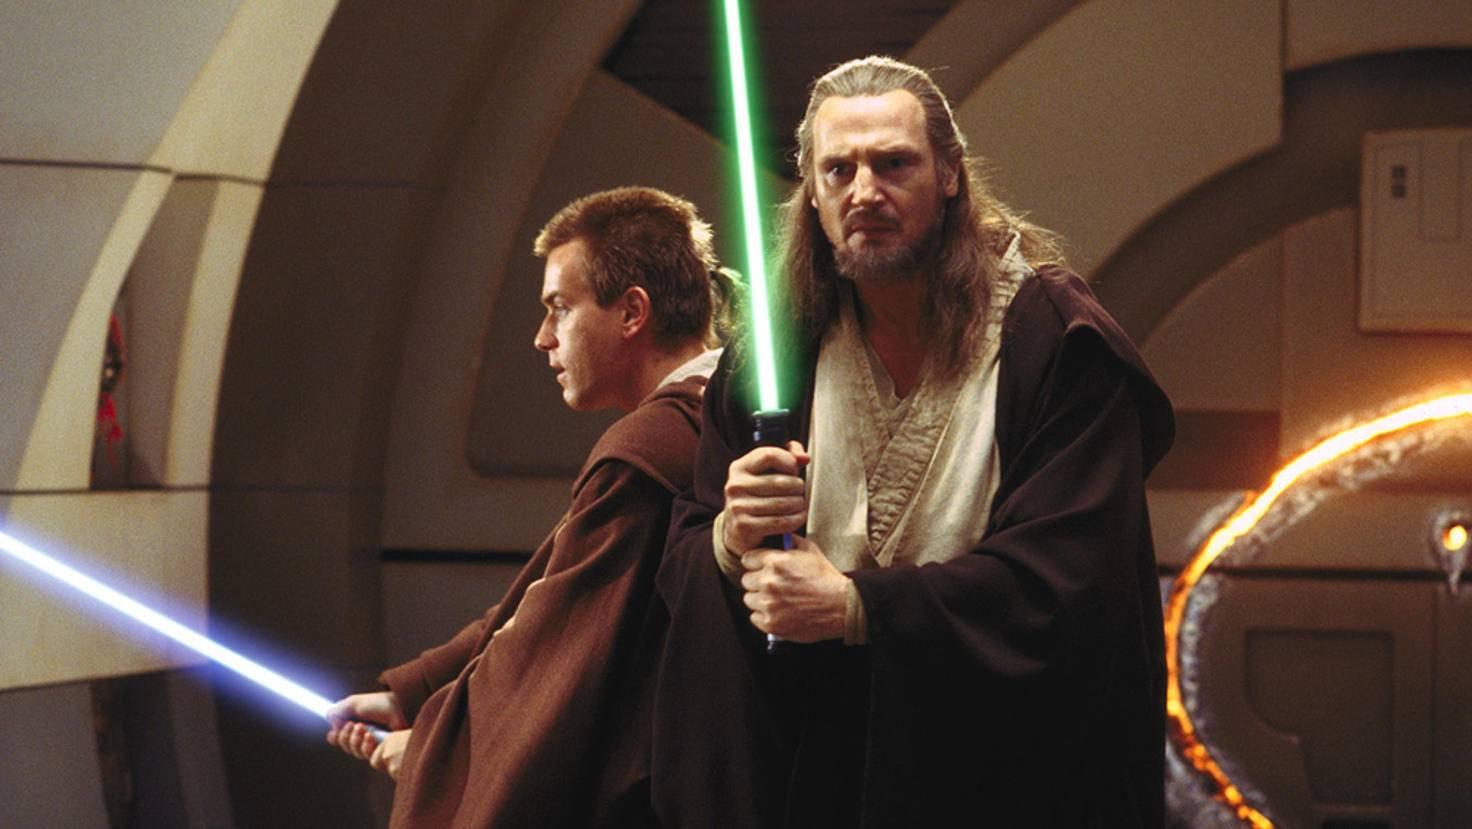 Liam Neeson-Star Wars-picture alliance kpa-7211662